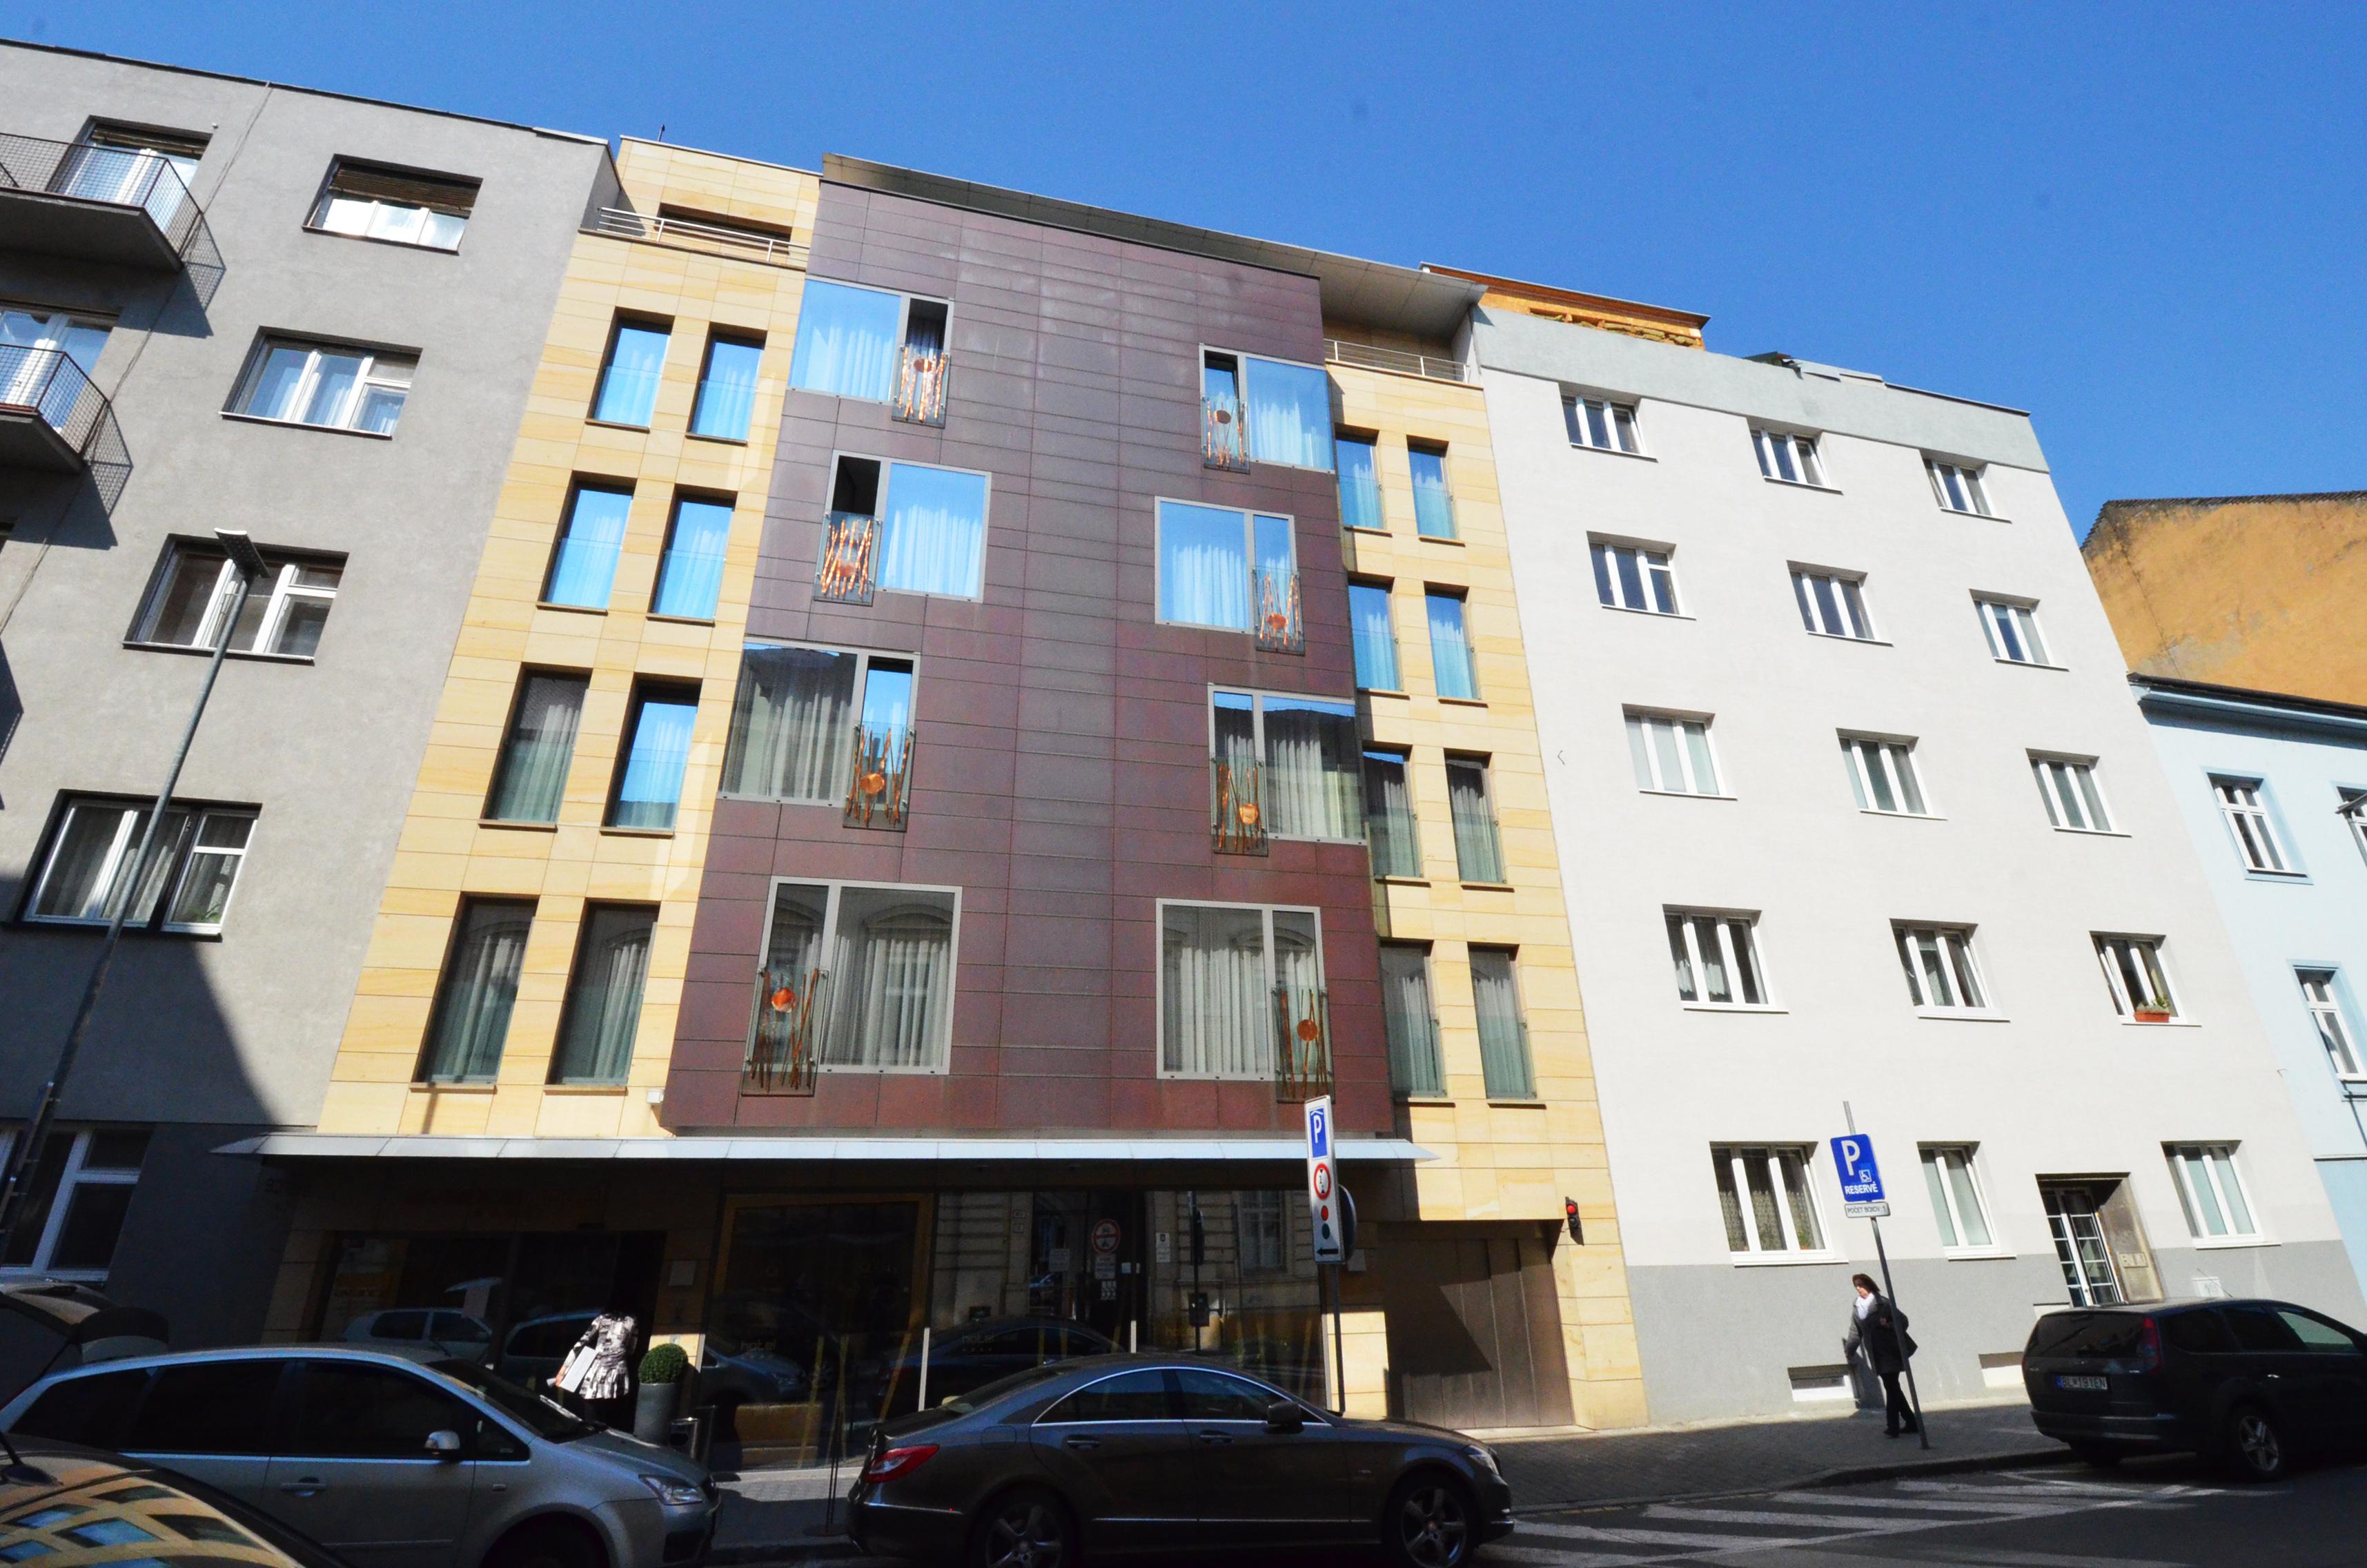 Hotel Avance, Bratislava_foto 1